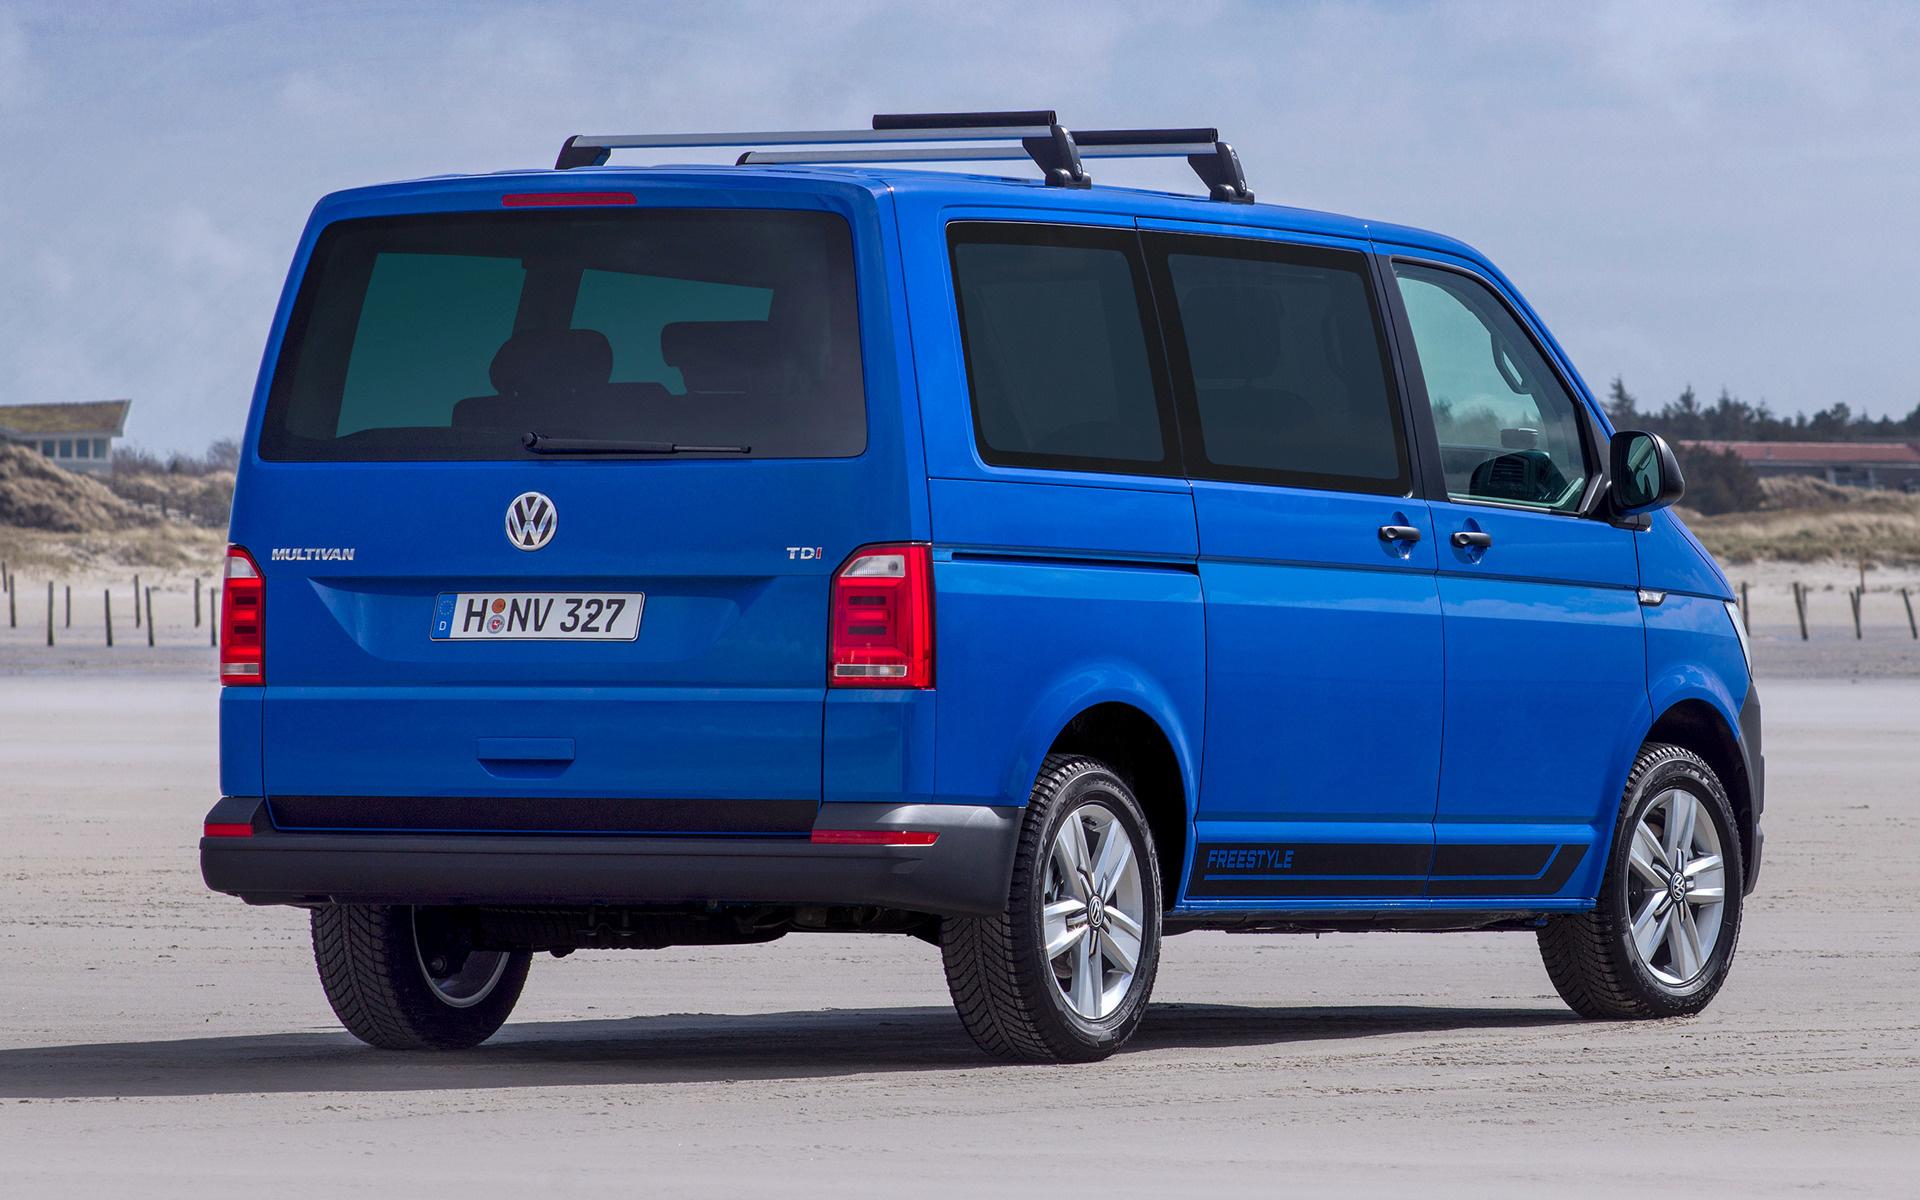 2016 Volkswagen Multivan Freestyle Wallpapers And Hd